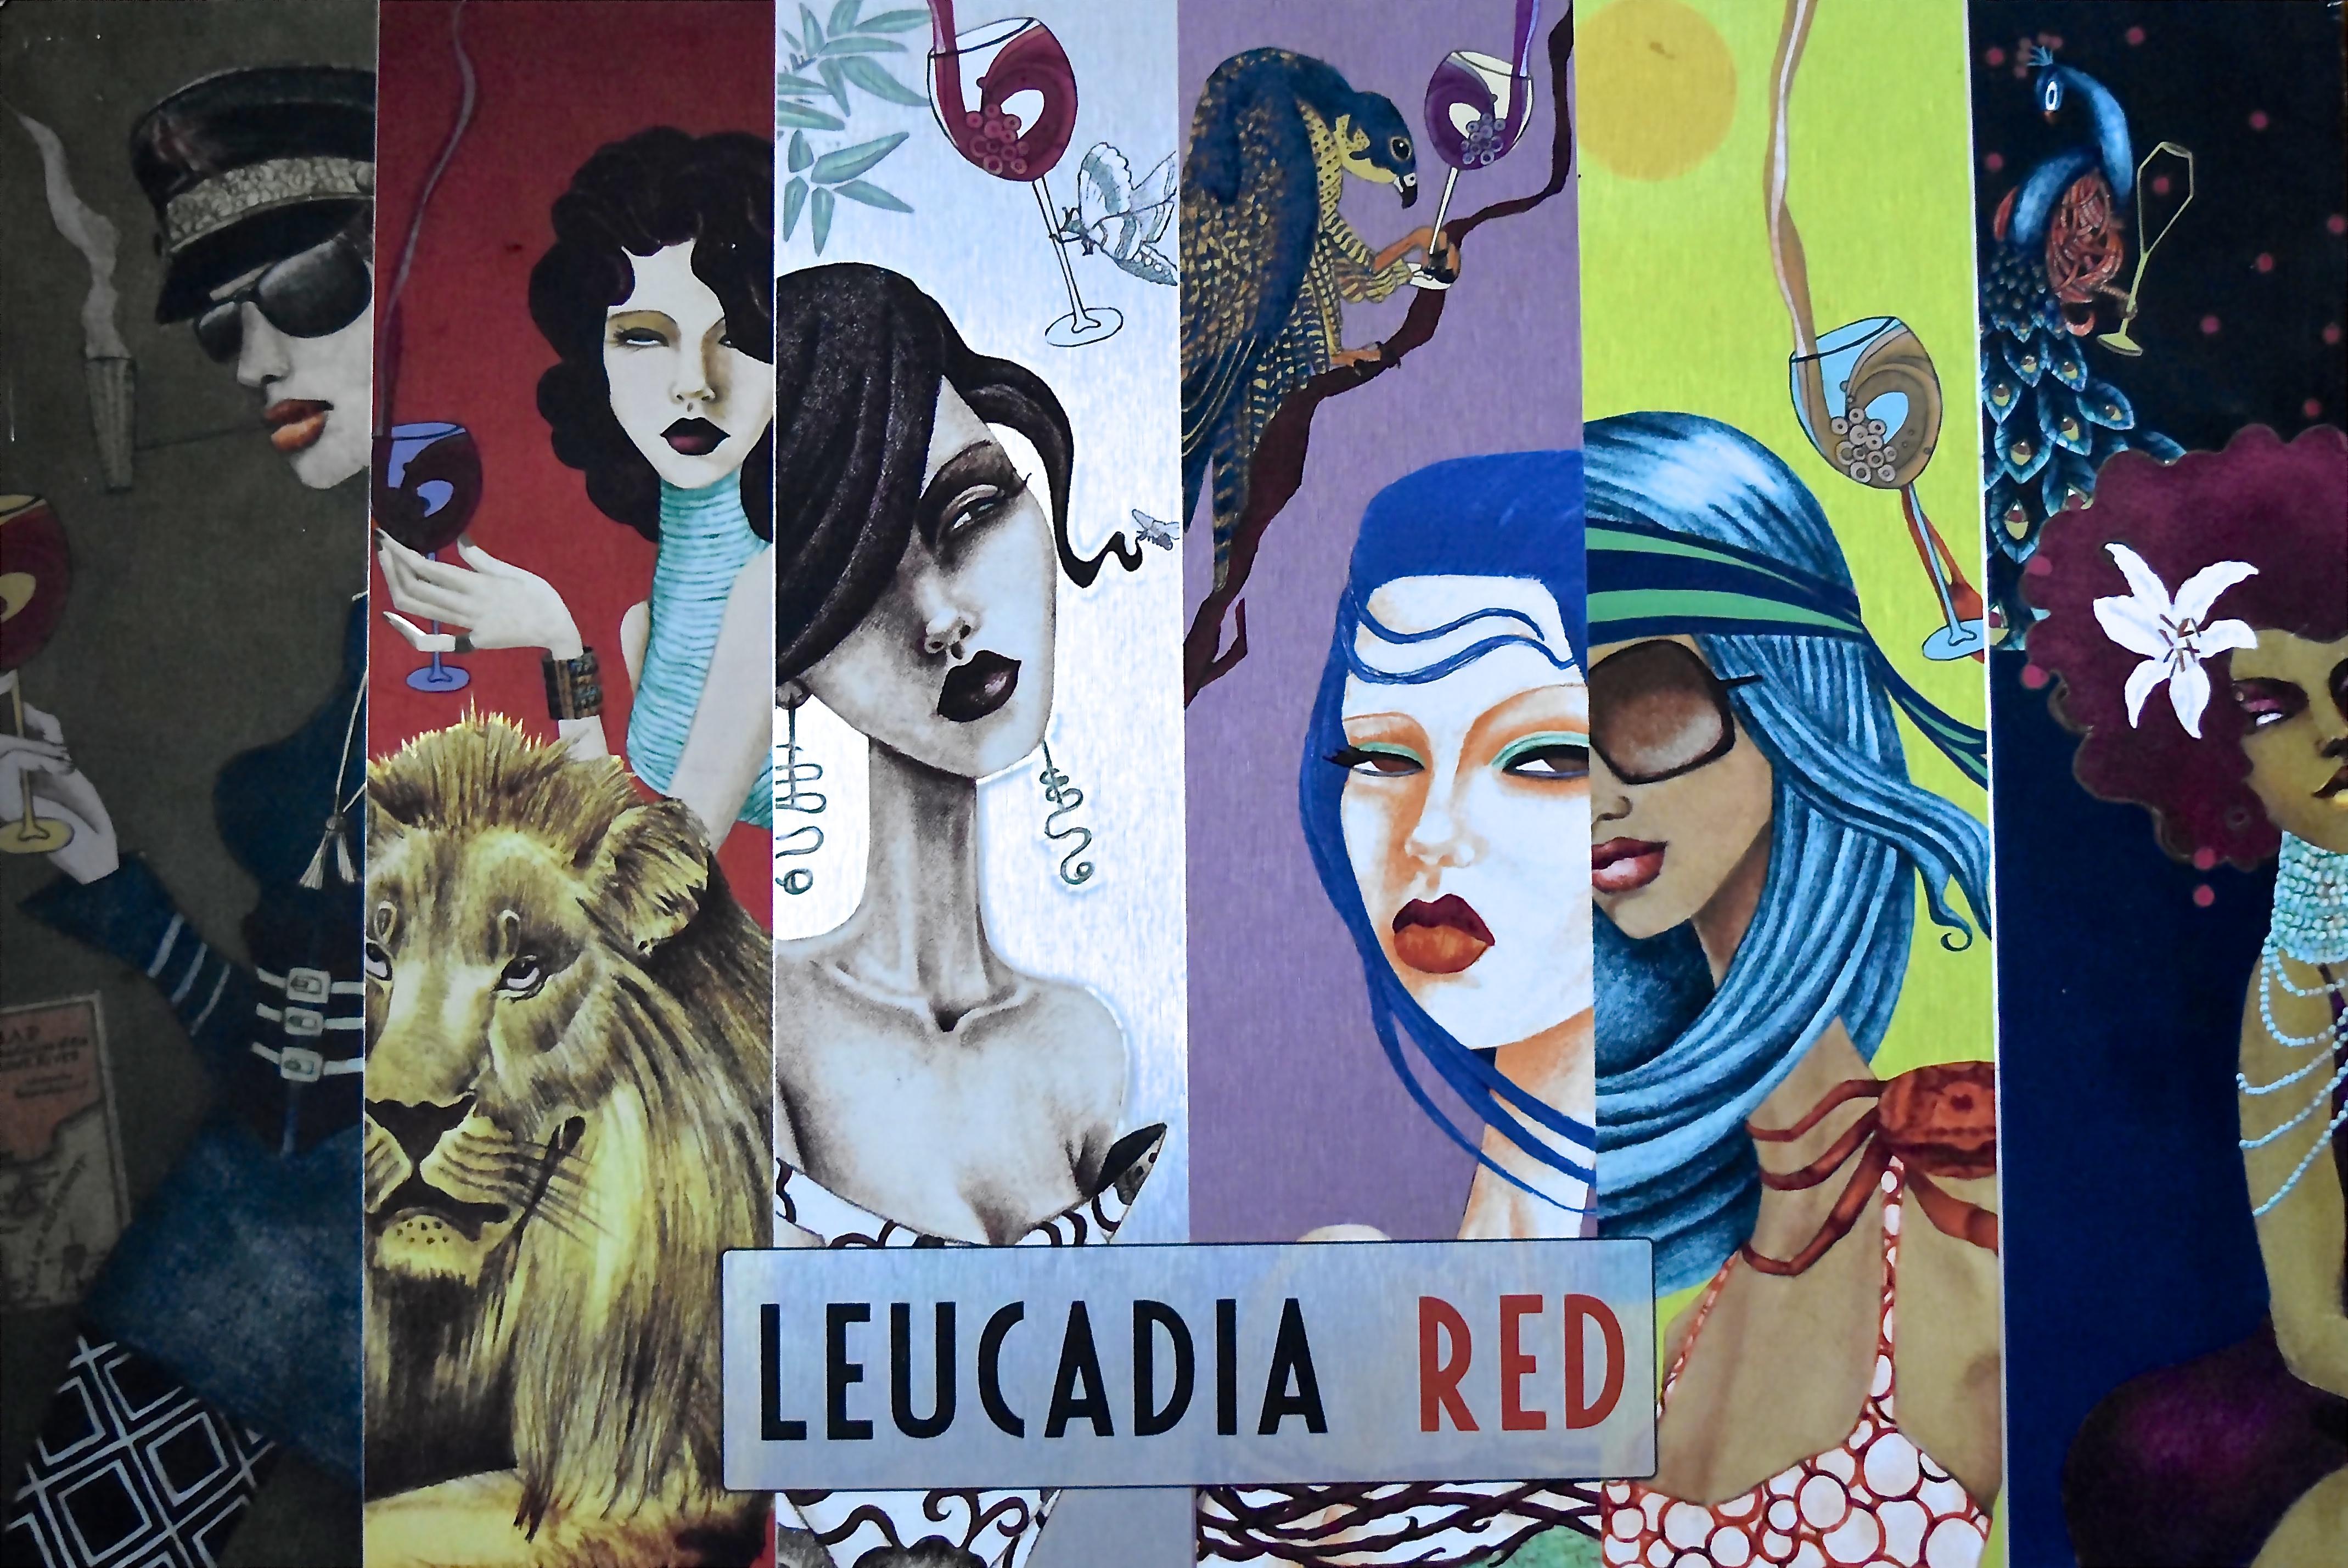 Leucadia Red Wine Label Collage